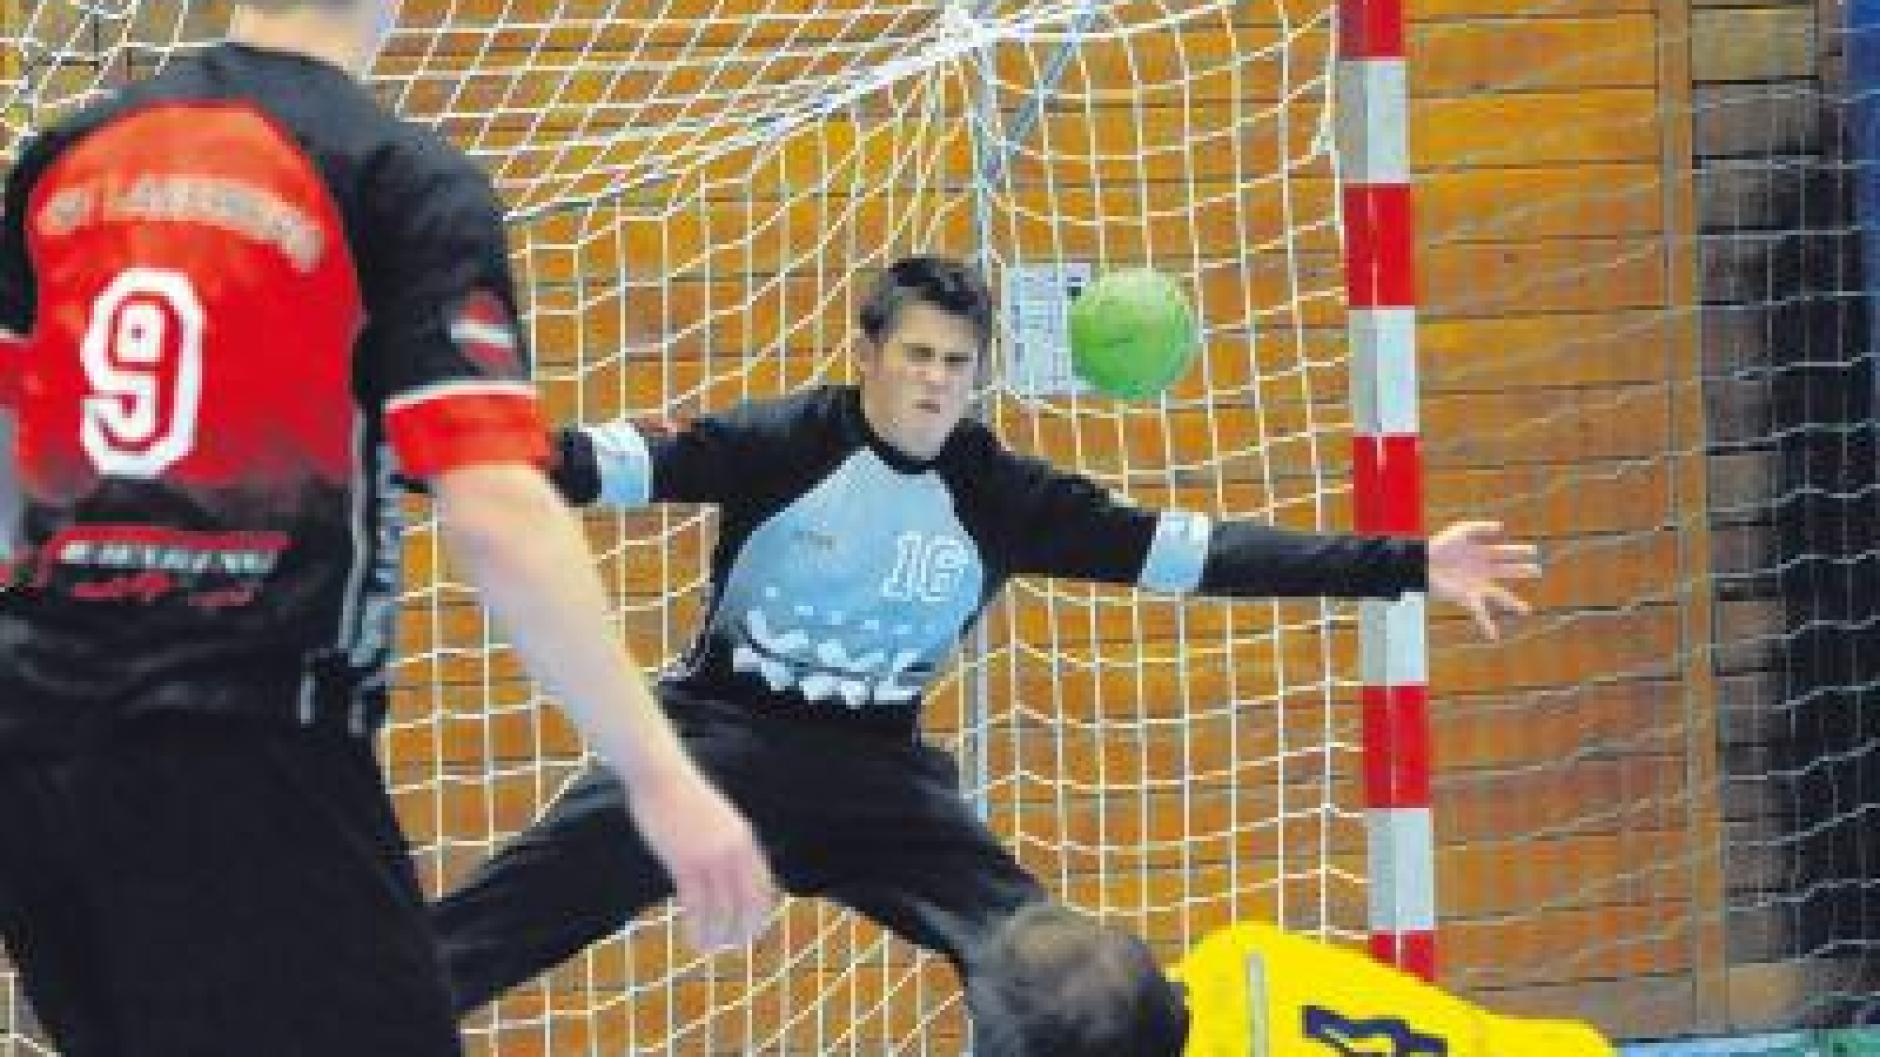 Handball, Landesliga: Klarer Erfolg in einem recht